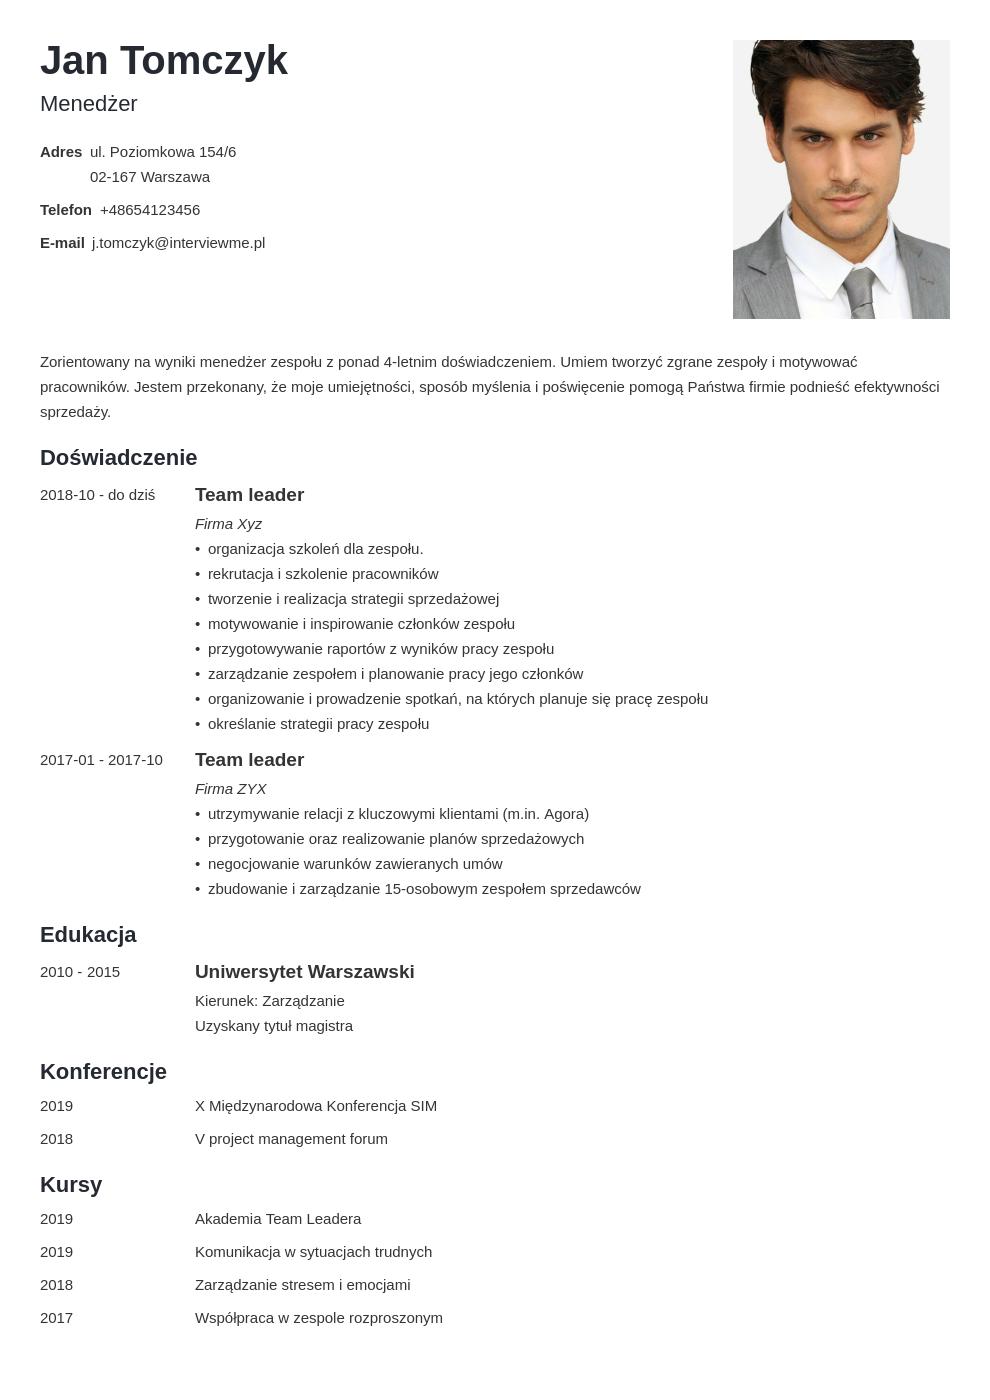 cv list motywacyjny managera template minimo